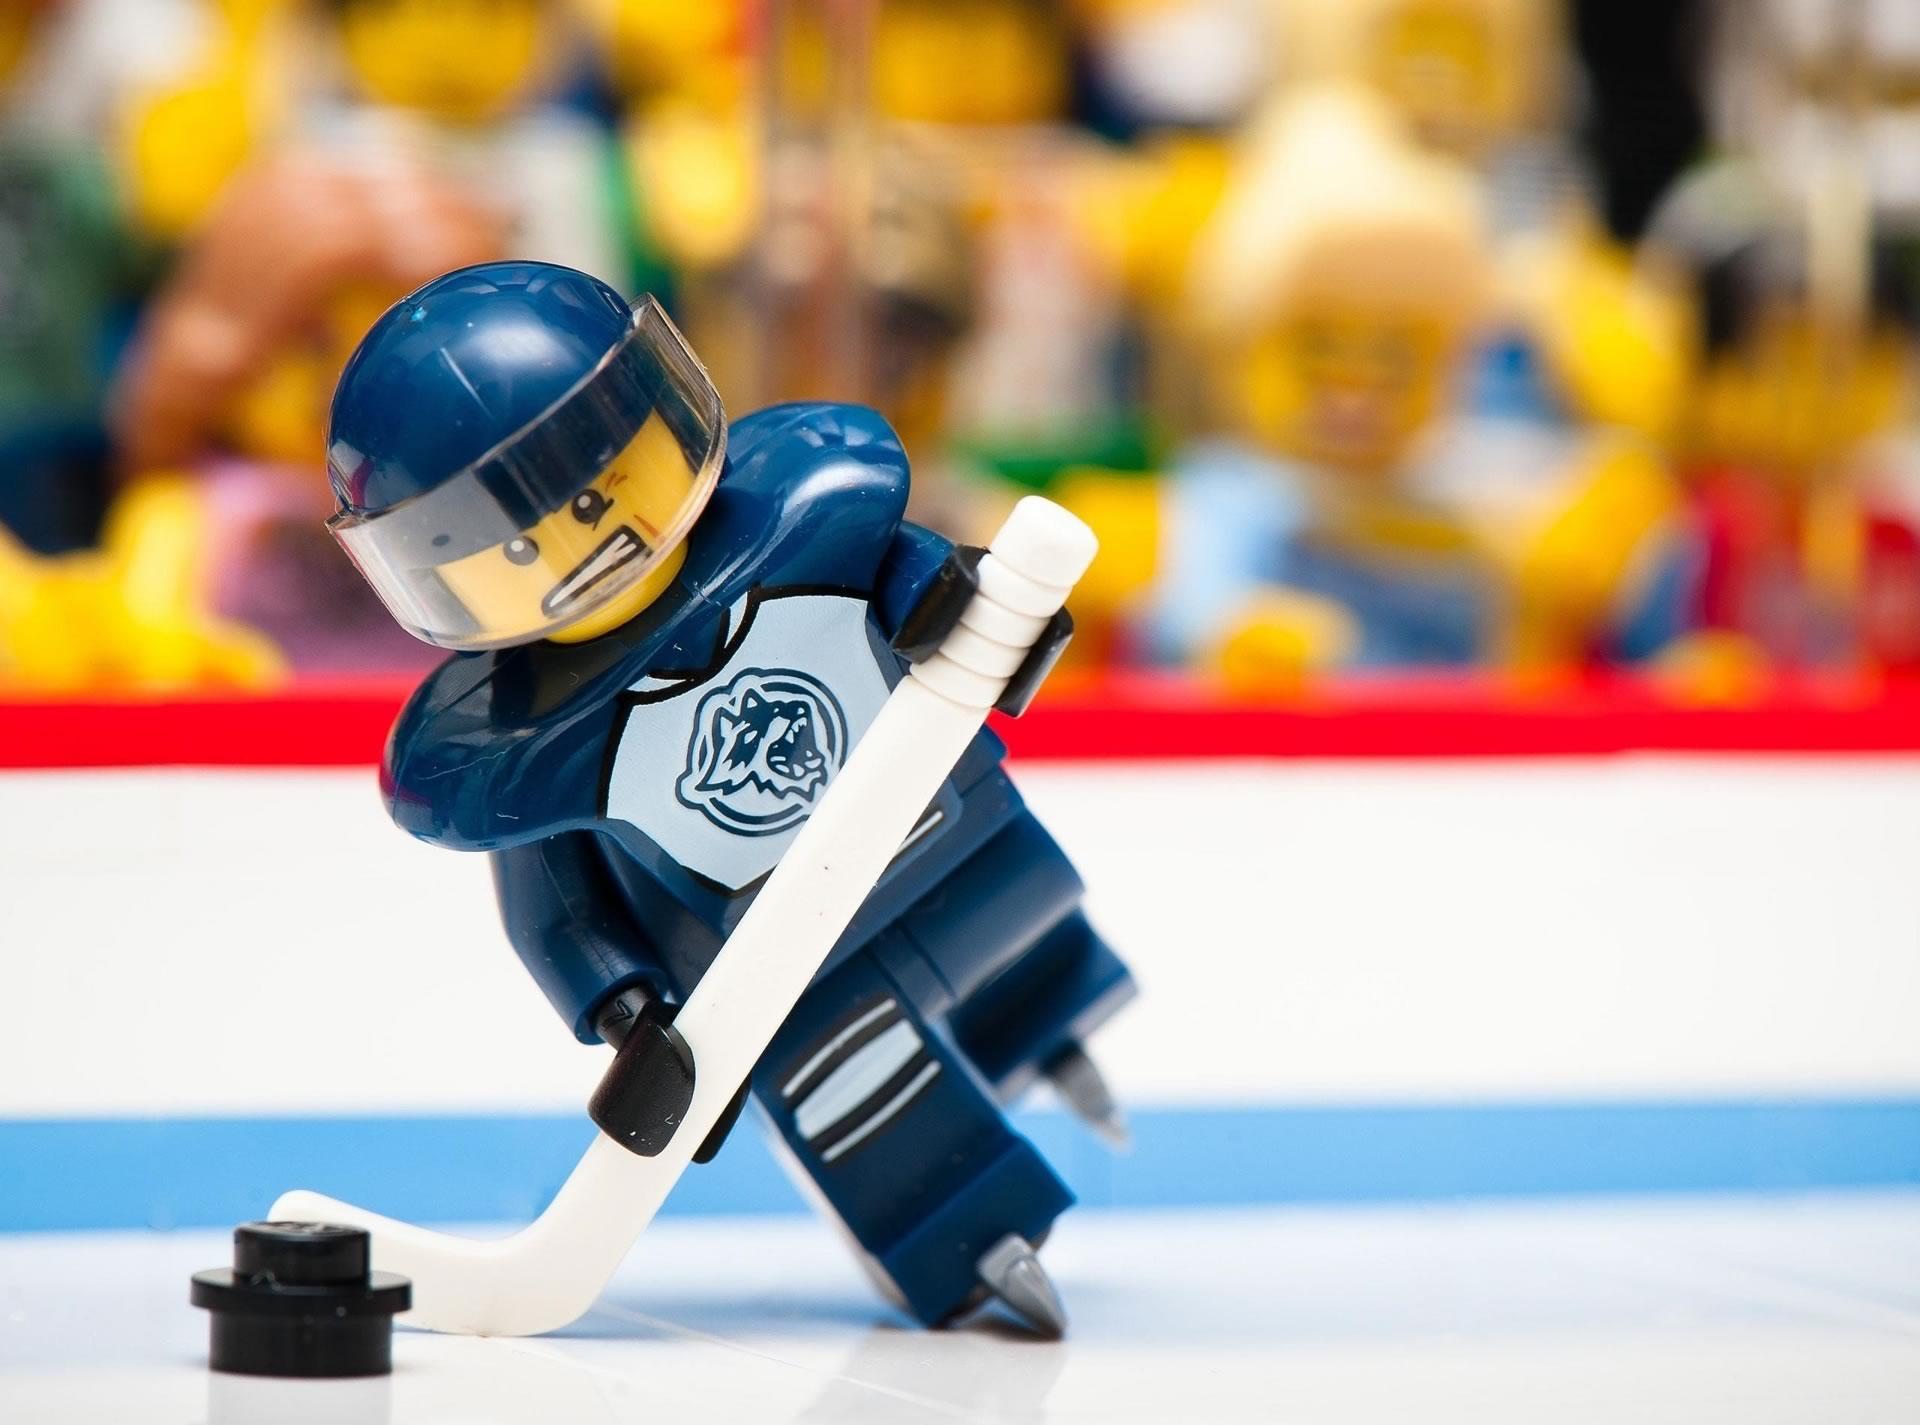 download wallpaper: Lego ijshockey wallpaper